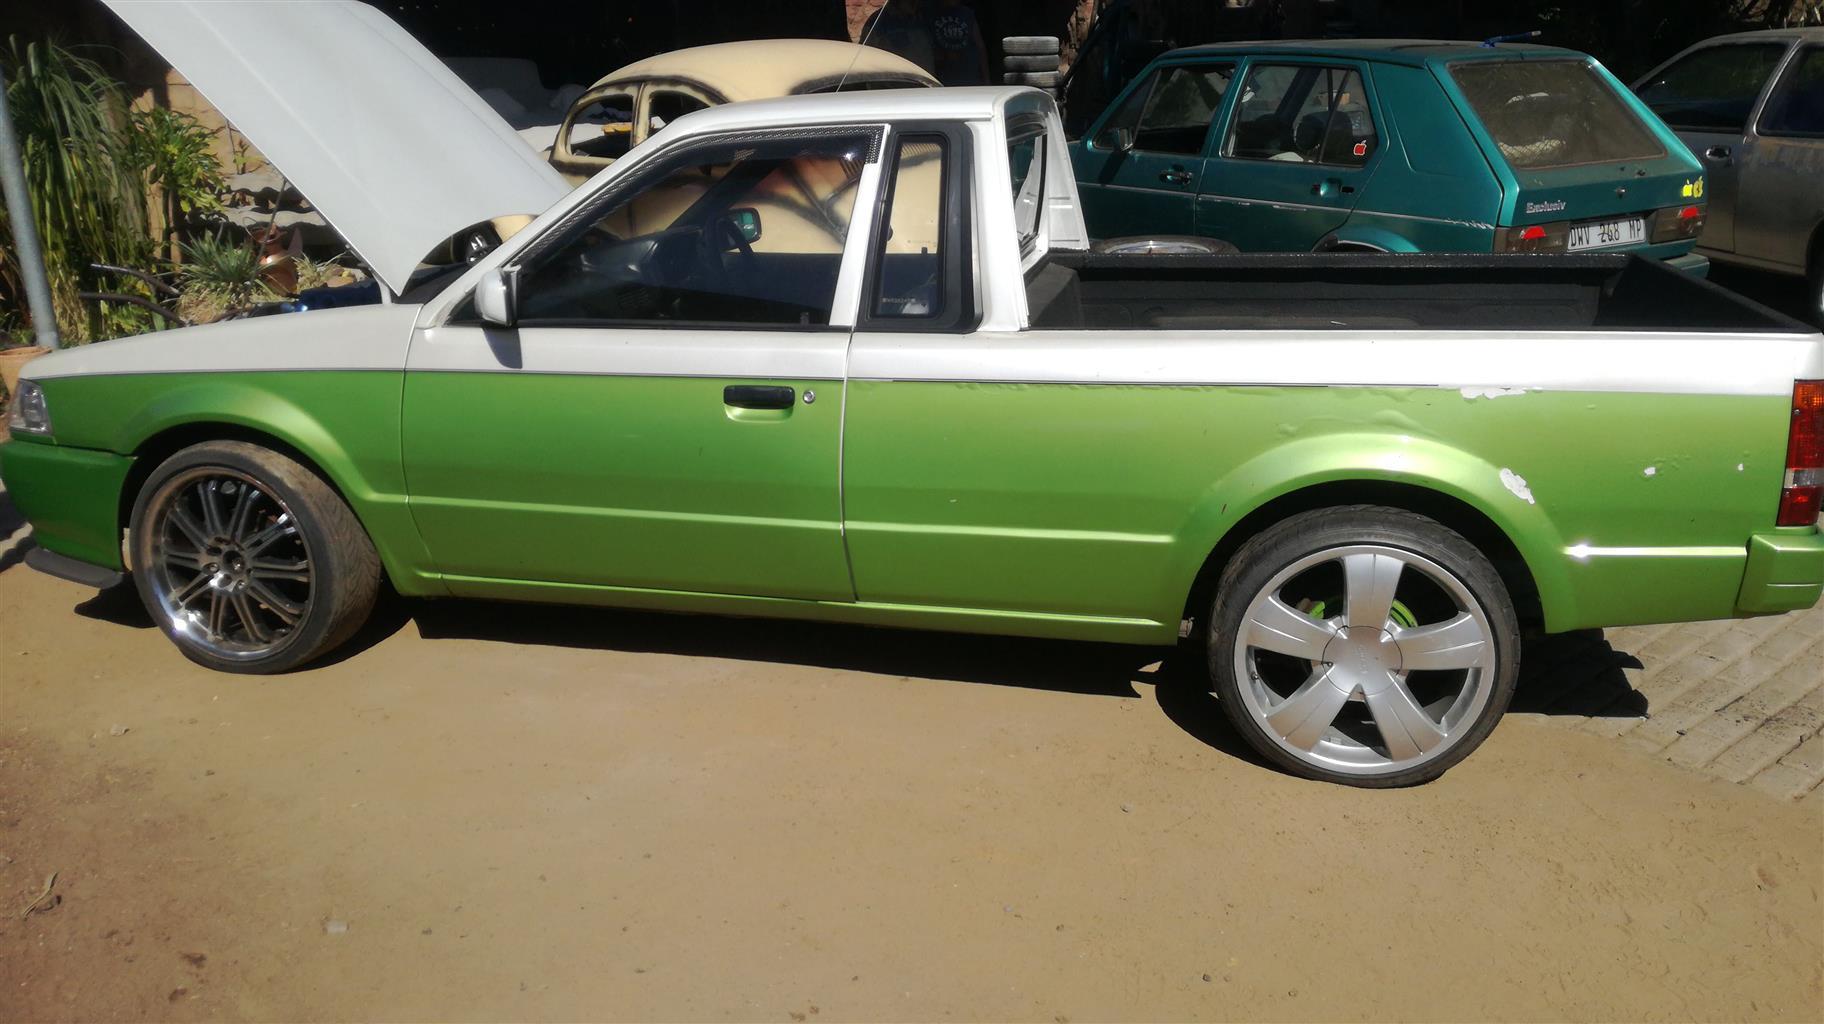 2000 mazda rustler Lexus 1uz non vvti, auto